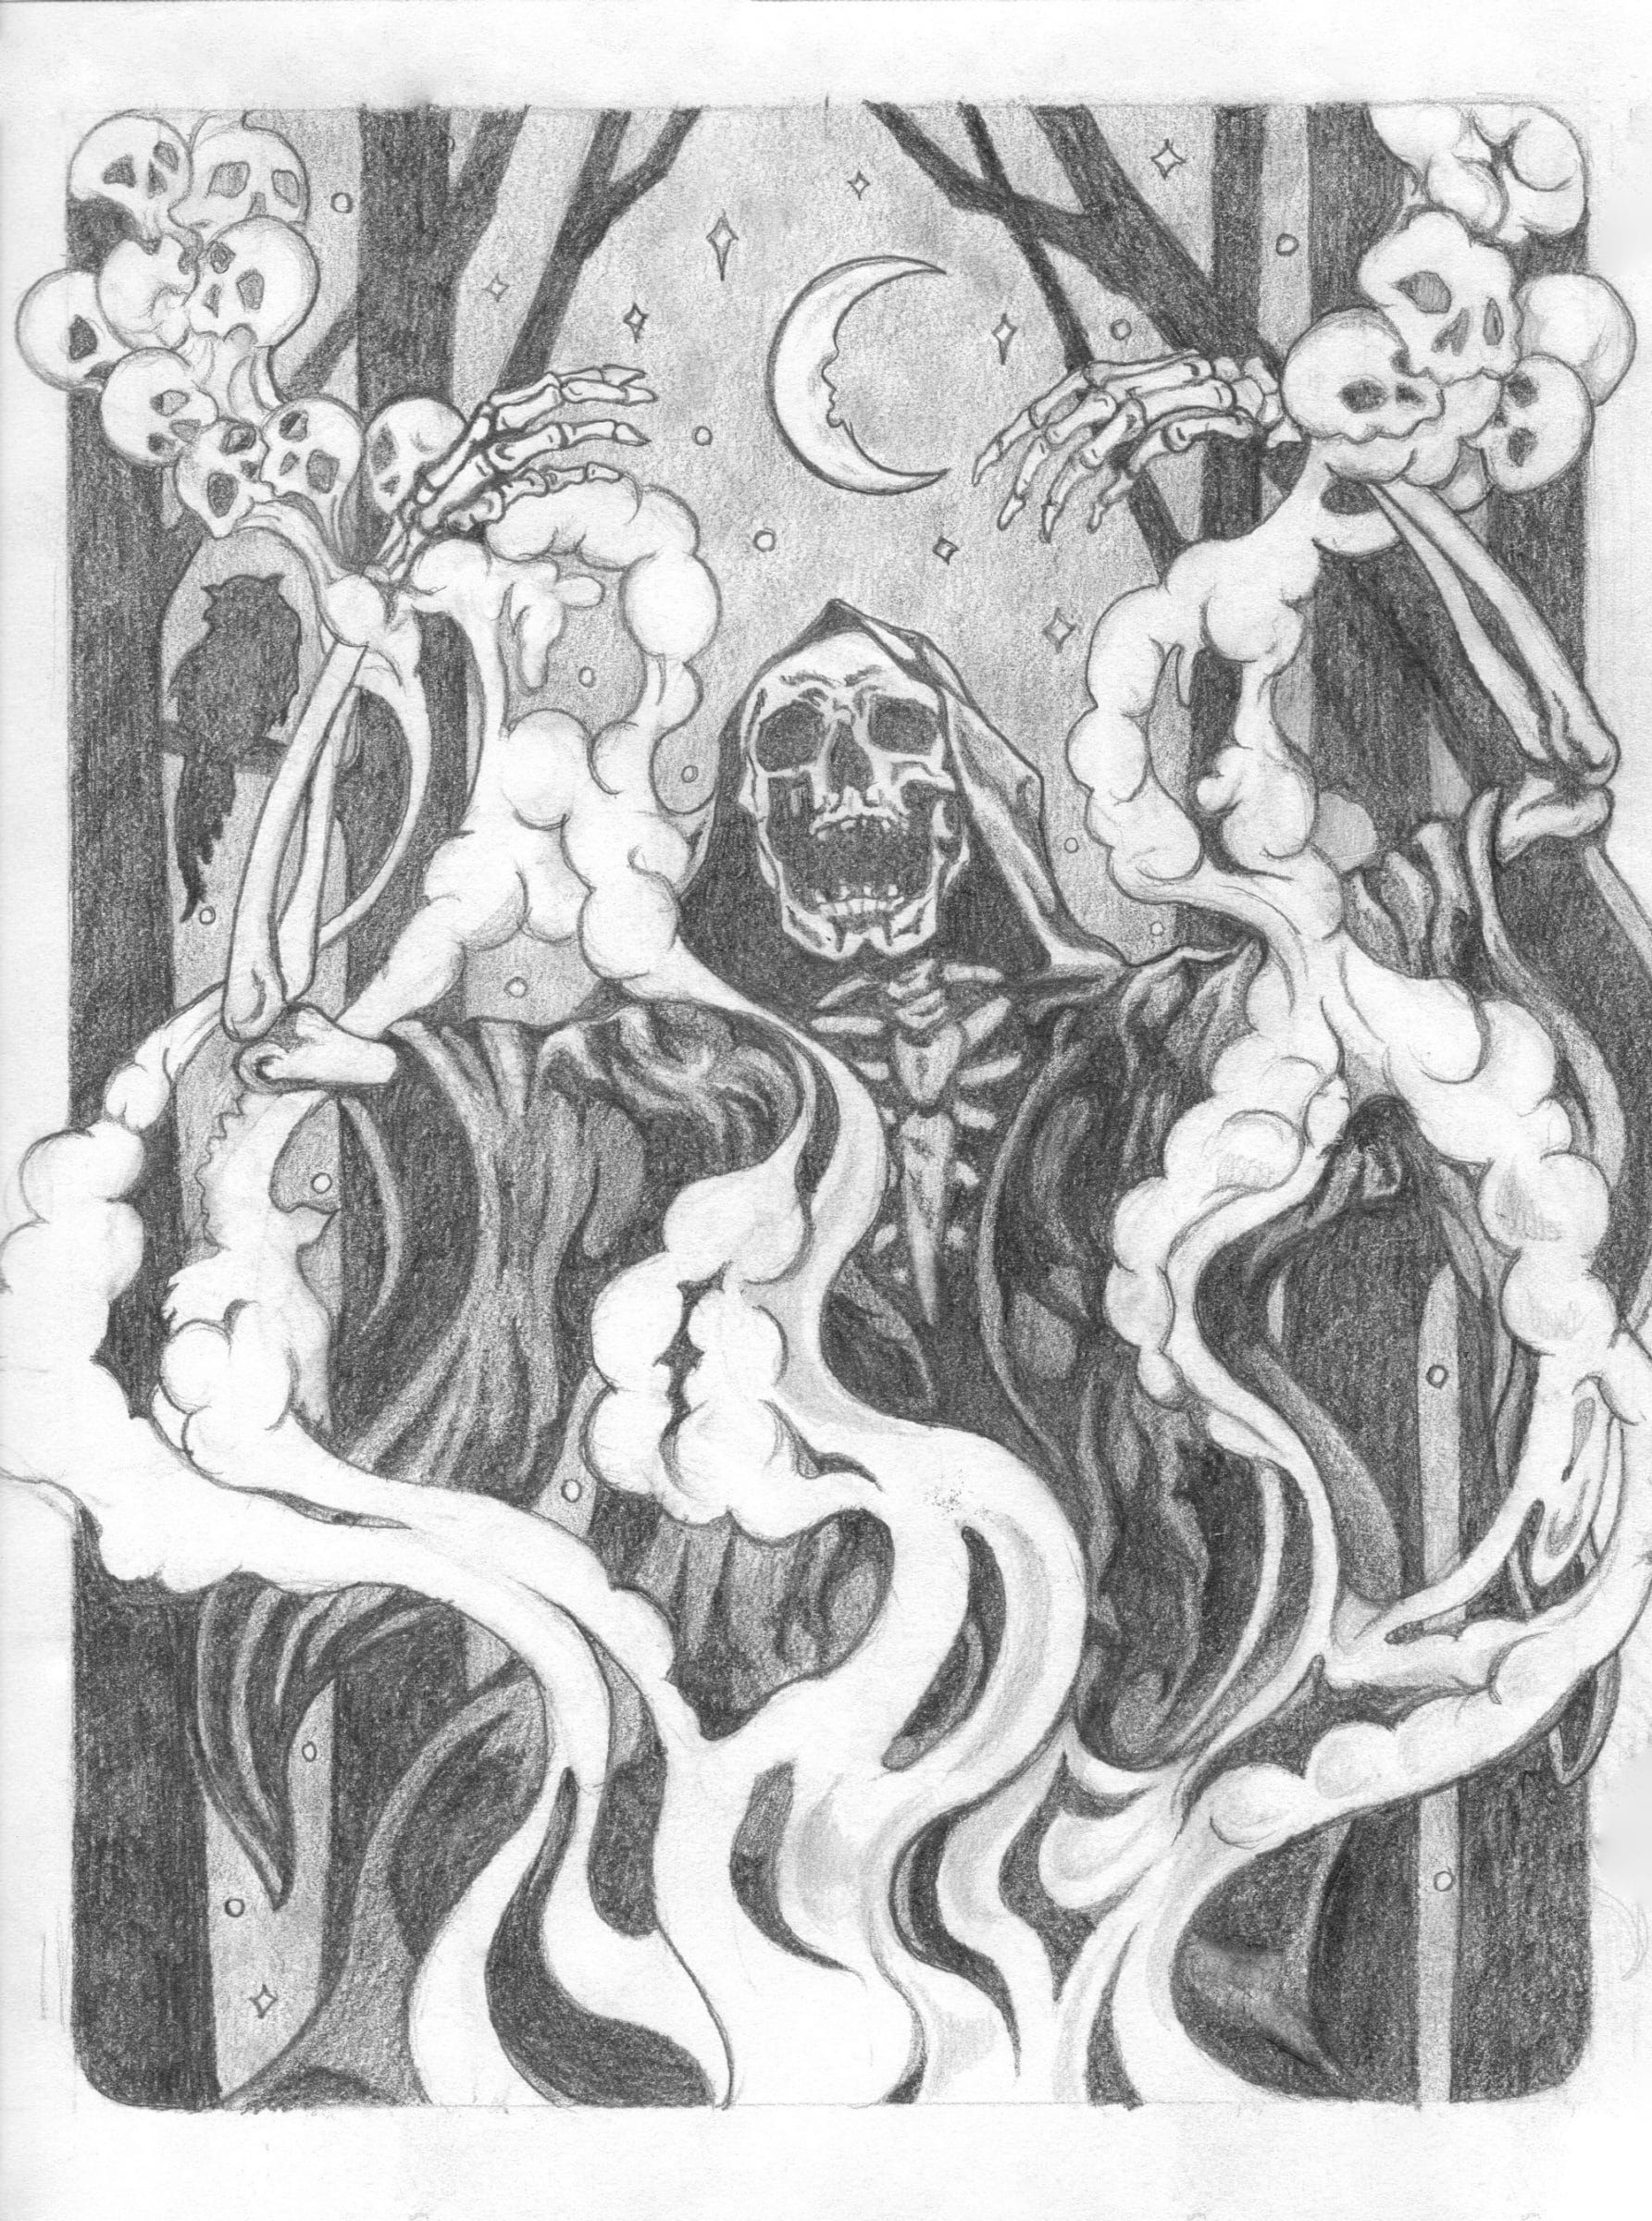 Conjuring Skeleton Sketch by Rebecca Magar - Wailing Wizard